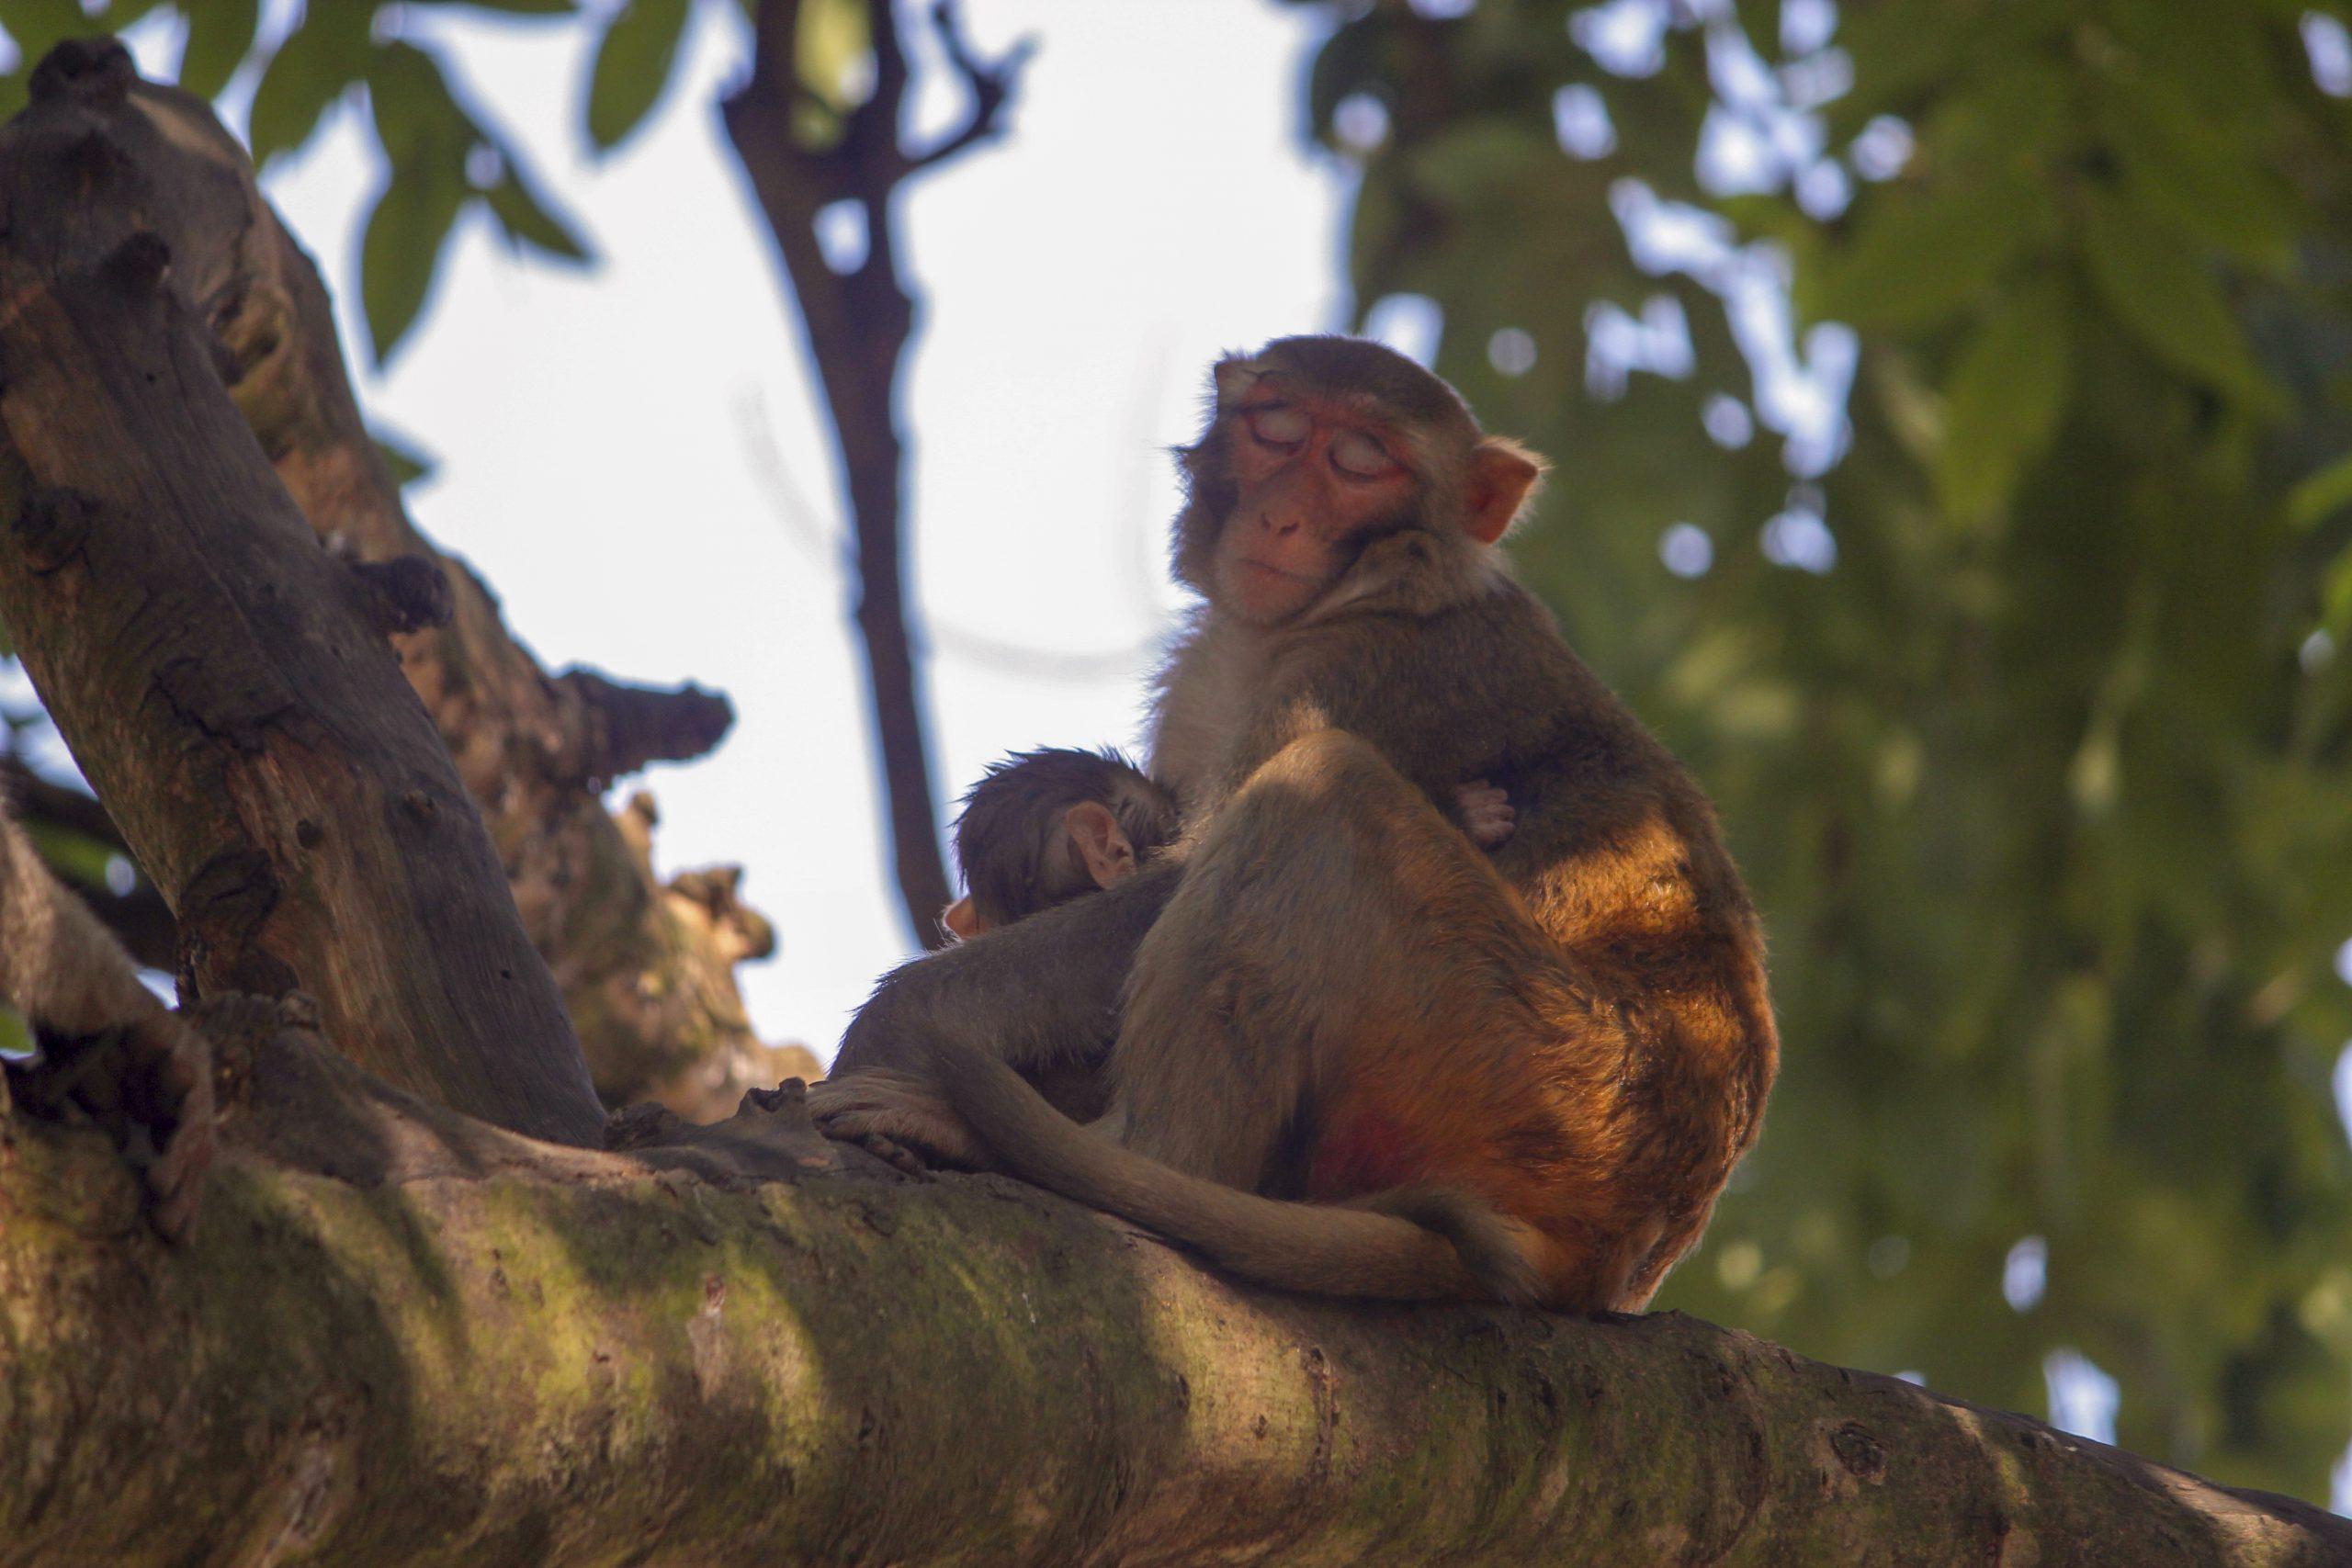 Monkey sleeping on a tree